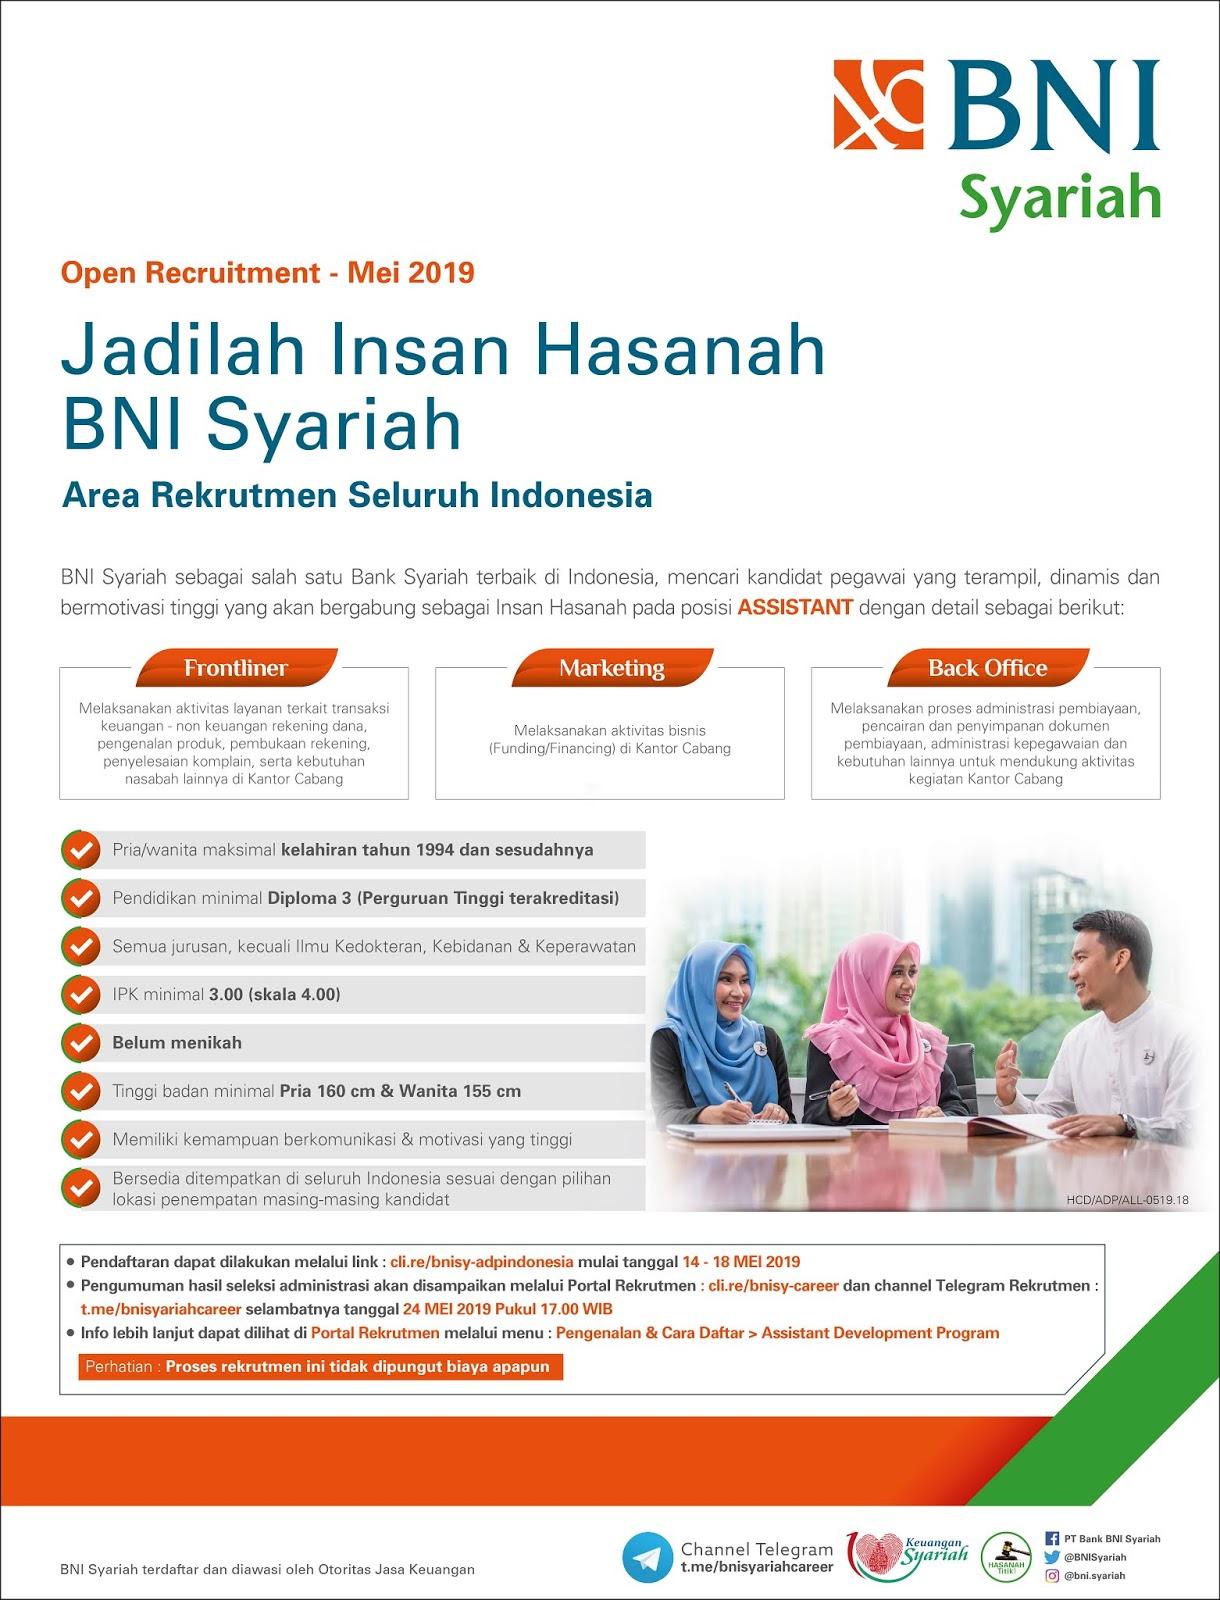 The best: cara join channel telegram bni syariah